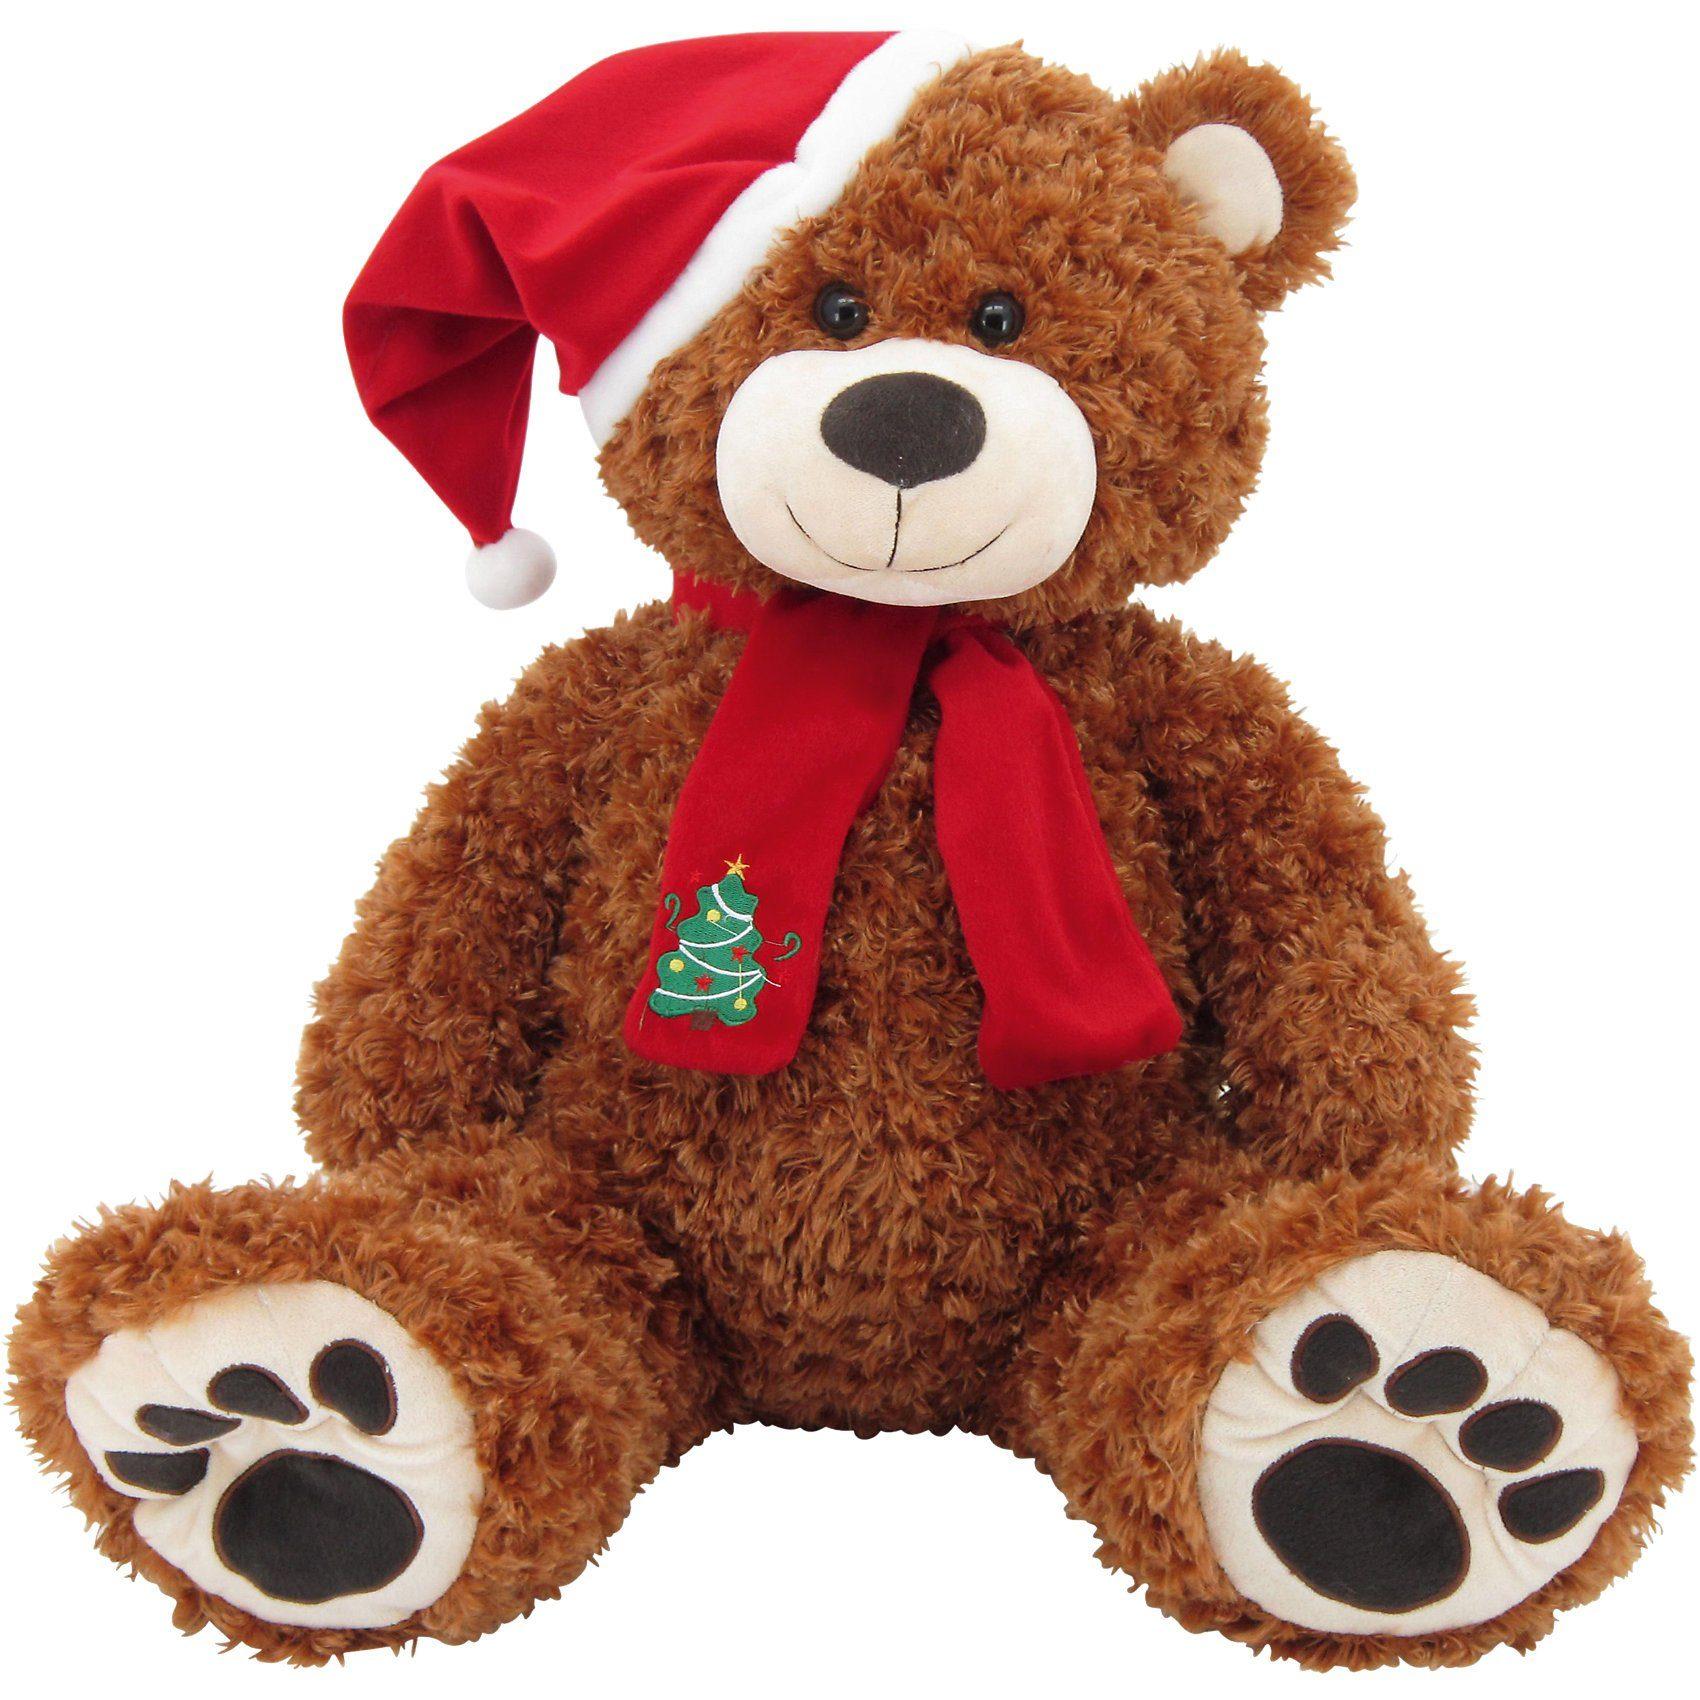 Sweety-Toys Sweety Toys 4744B XXL Riesen Teddybär Weihnachtsbär braun Te